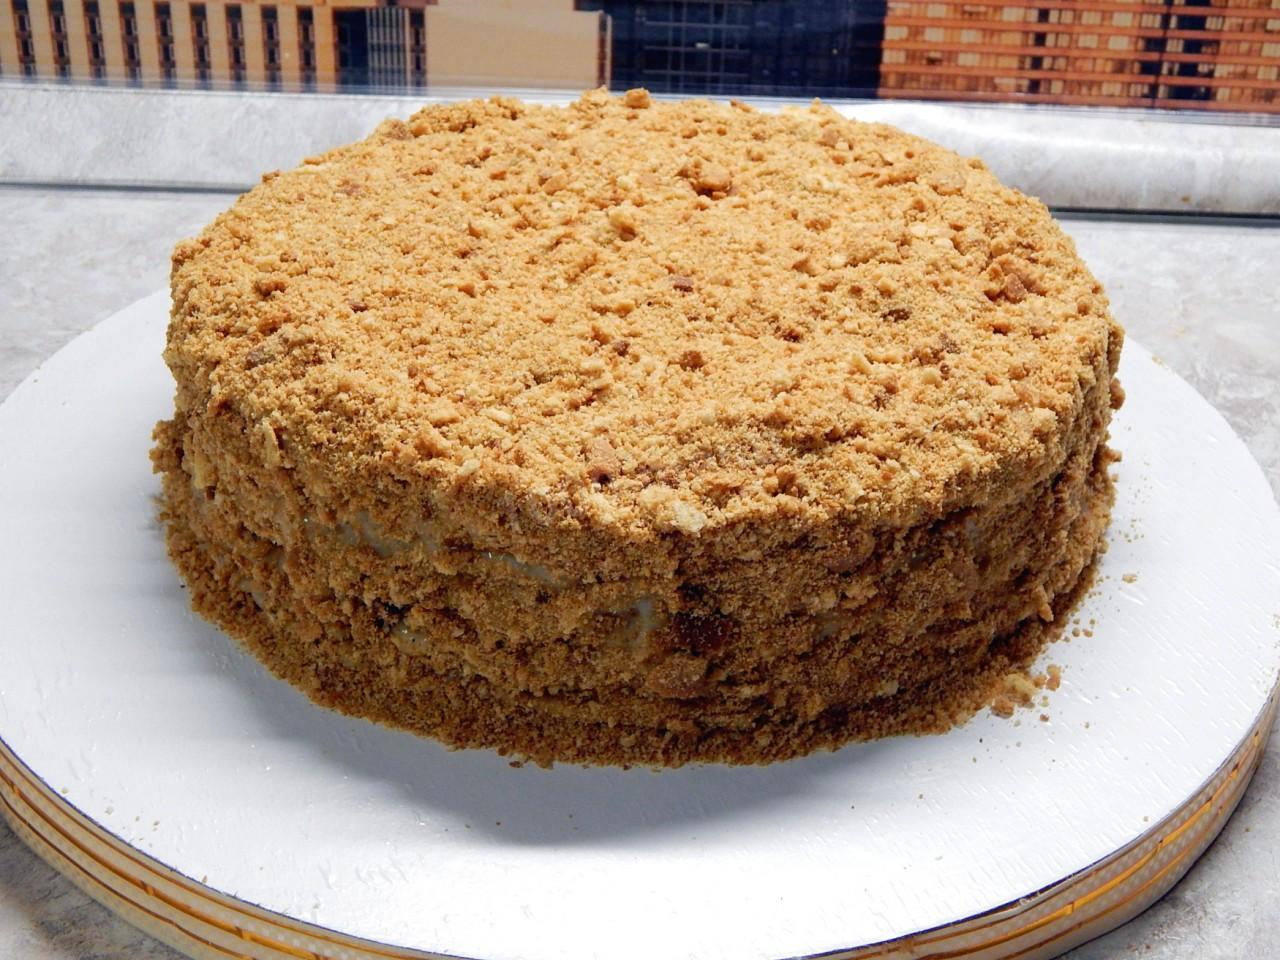 приора торт каприз рецепт с фото пошагово рацион питания